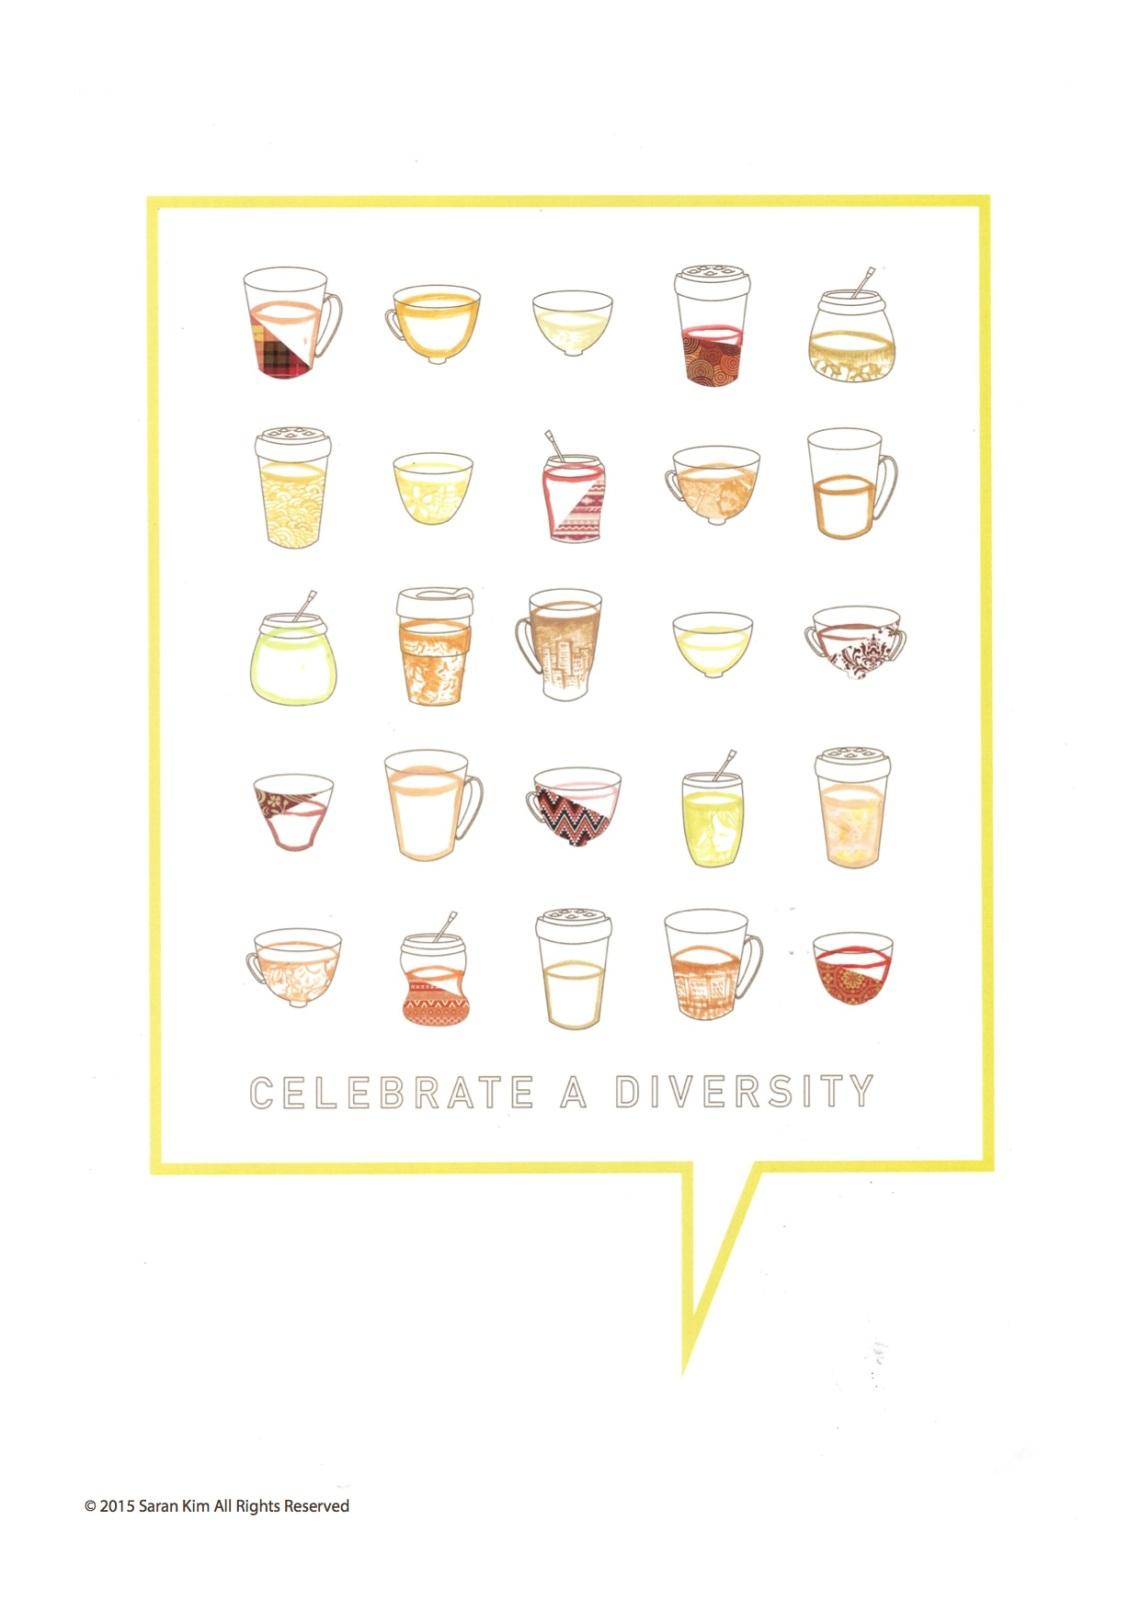 Celebrate a diversity